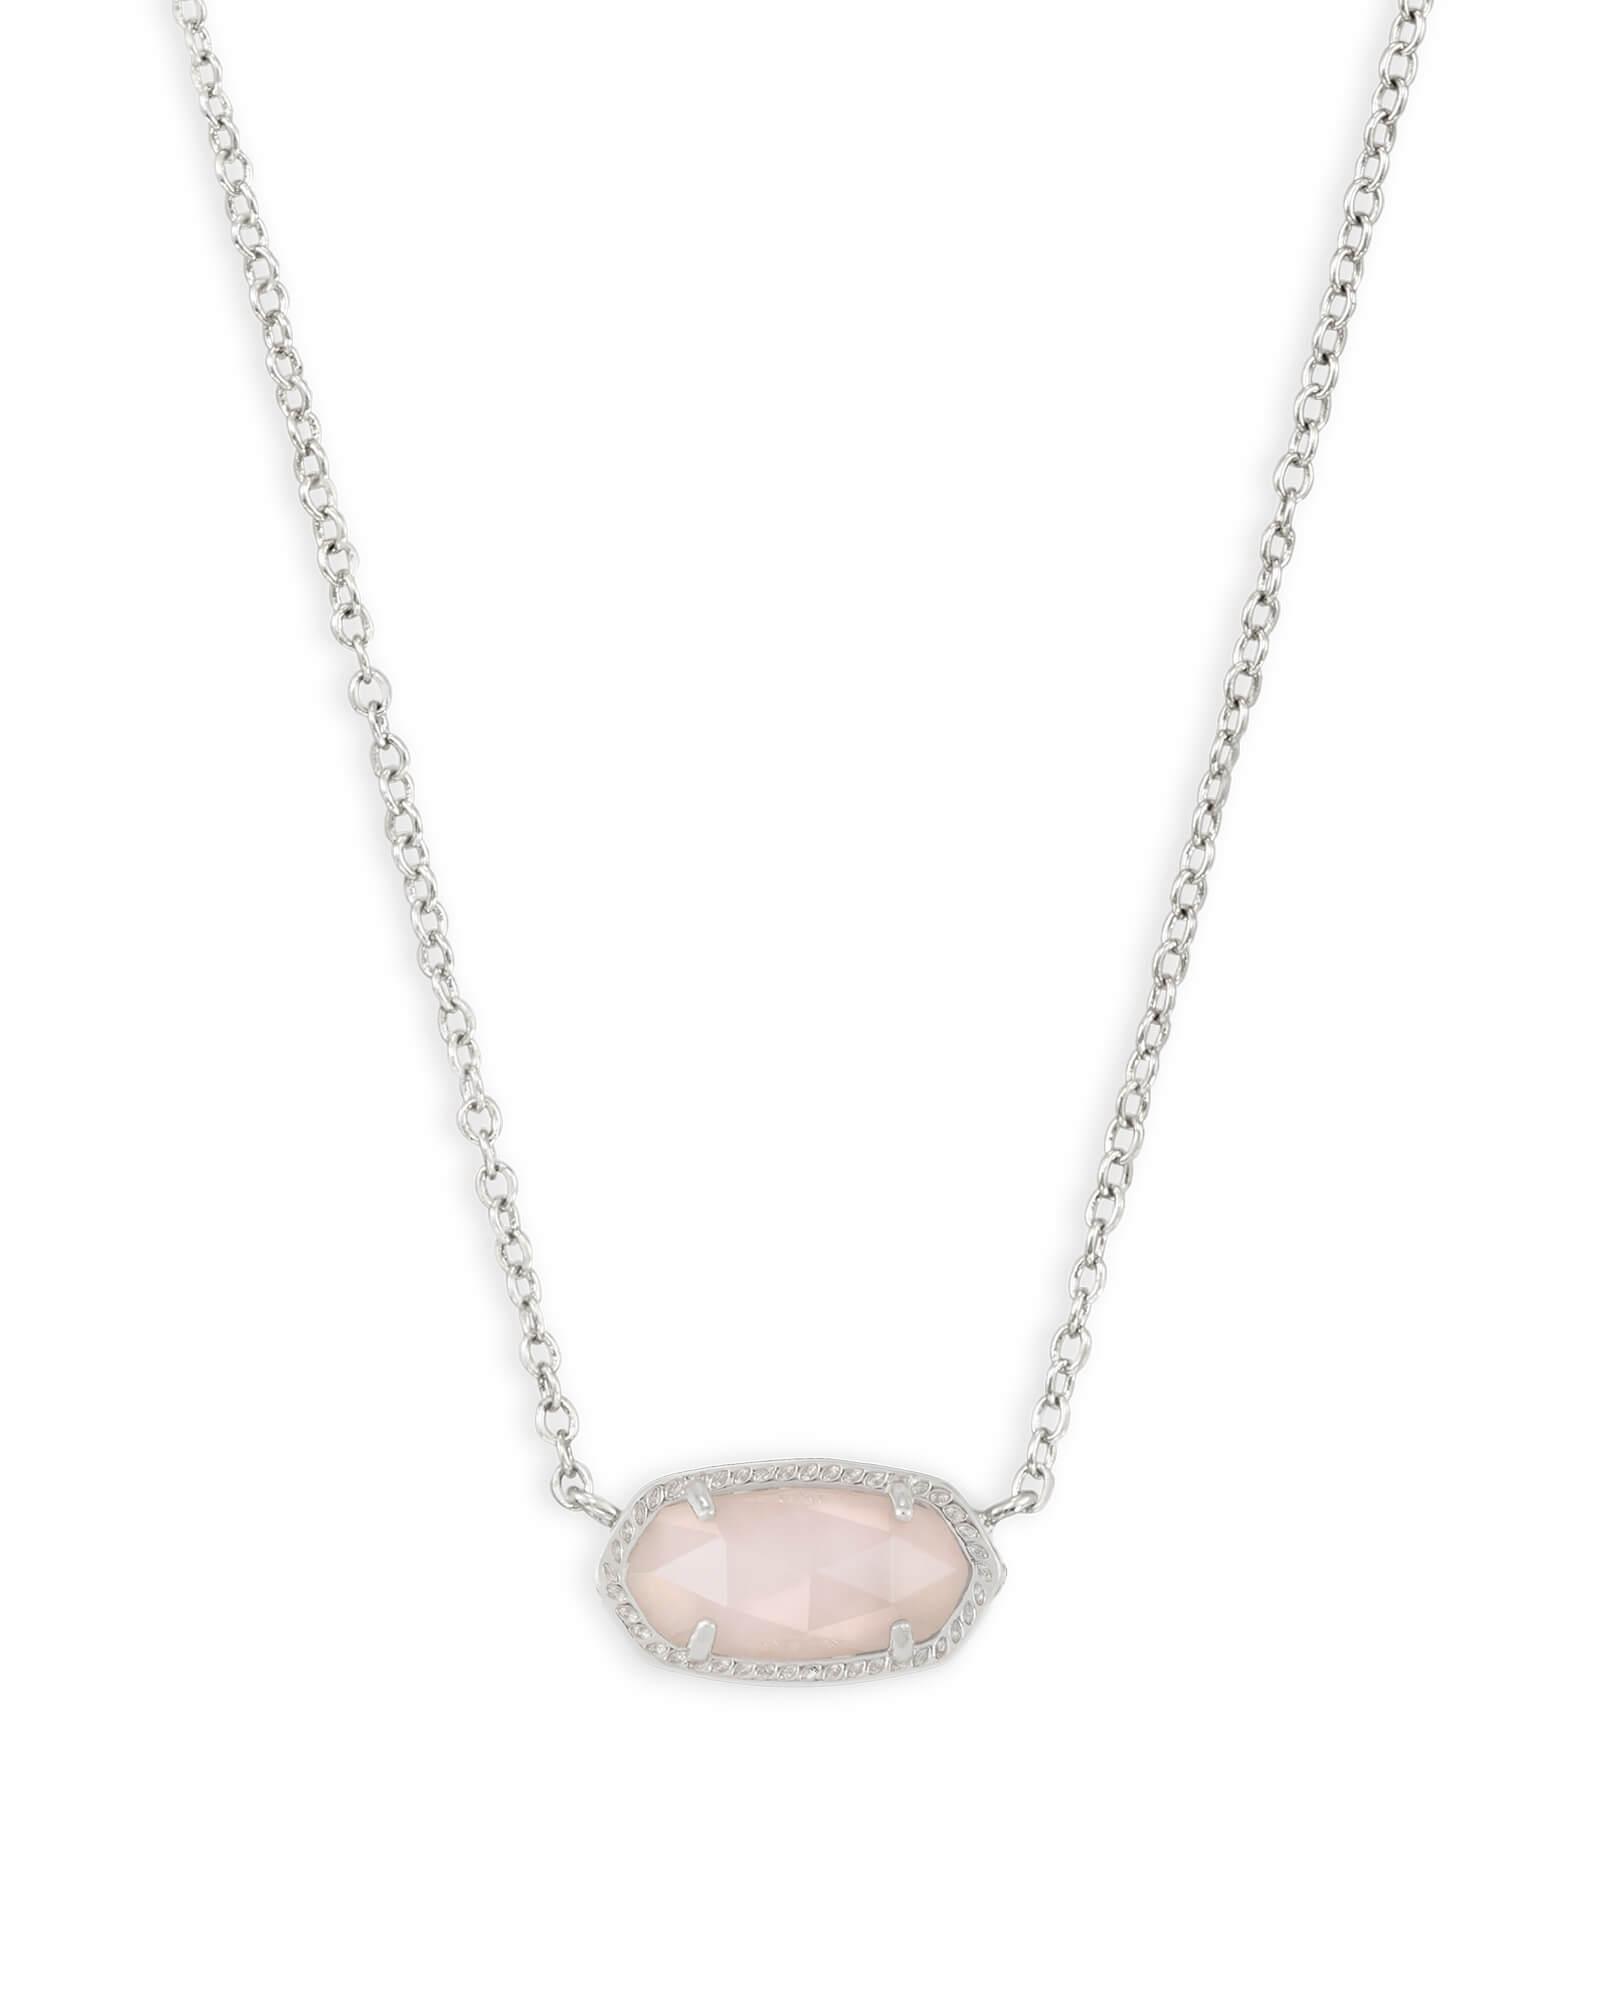 Elisa silver pendant necklace in rose quartz kendra scott elisa silver pendant necklace in rose quartz aloadofball Images